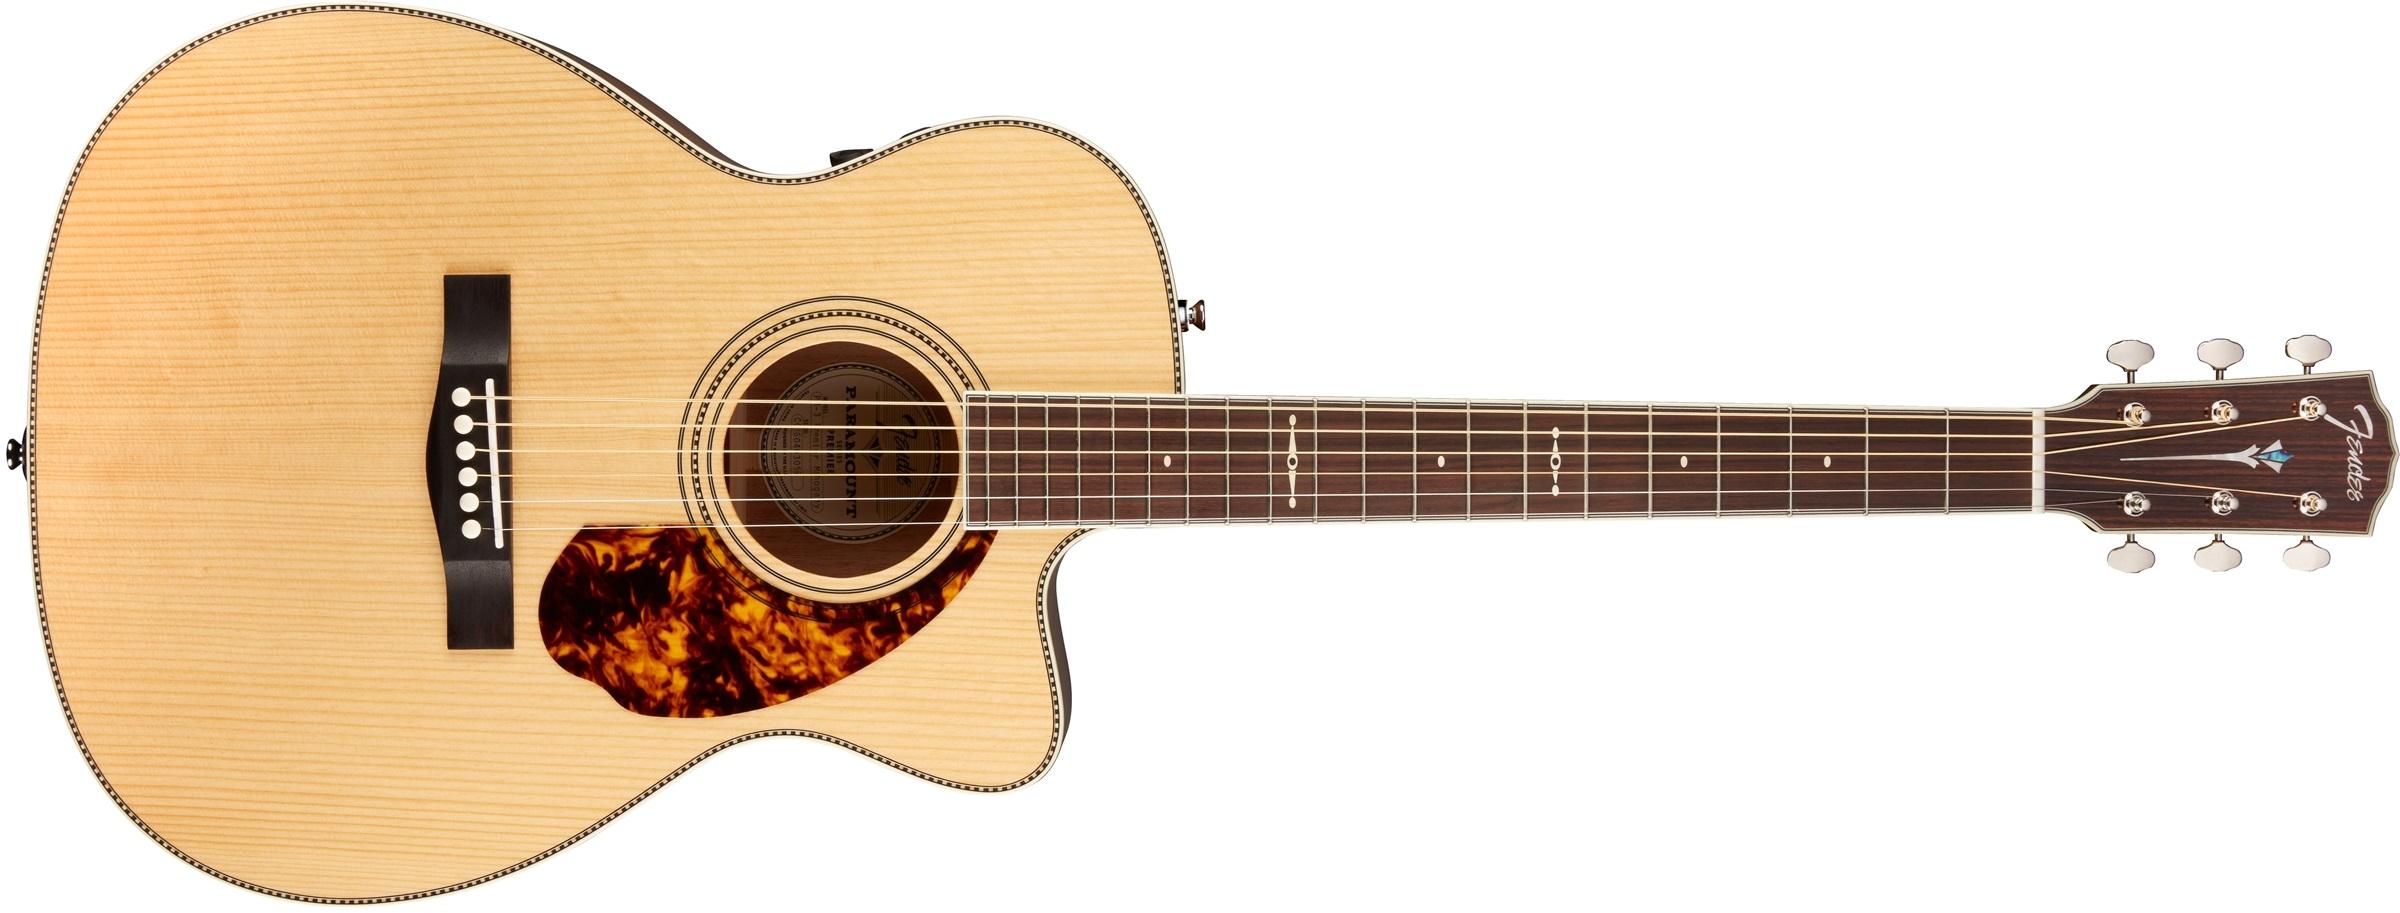 Fender PM-3 Limited Adirondack Mahogany NAT